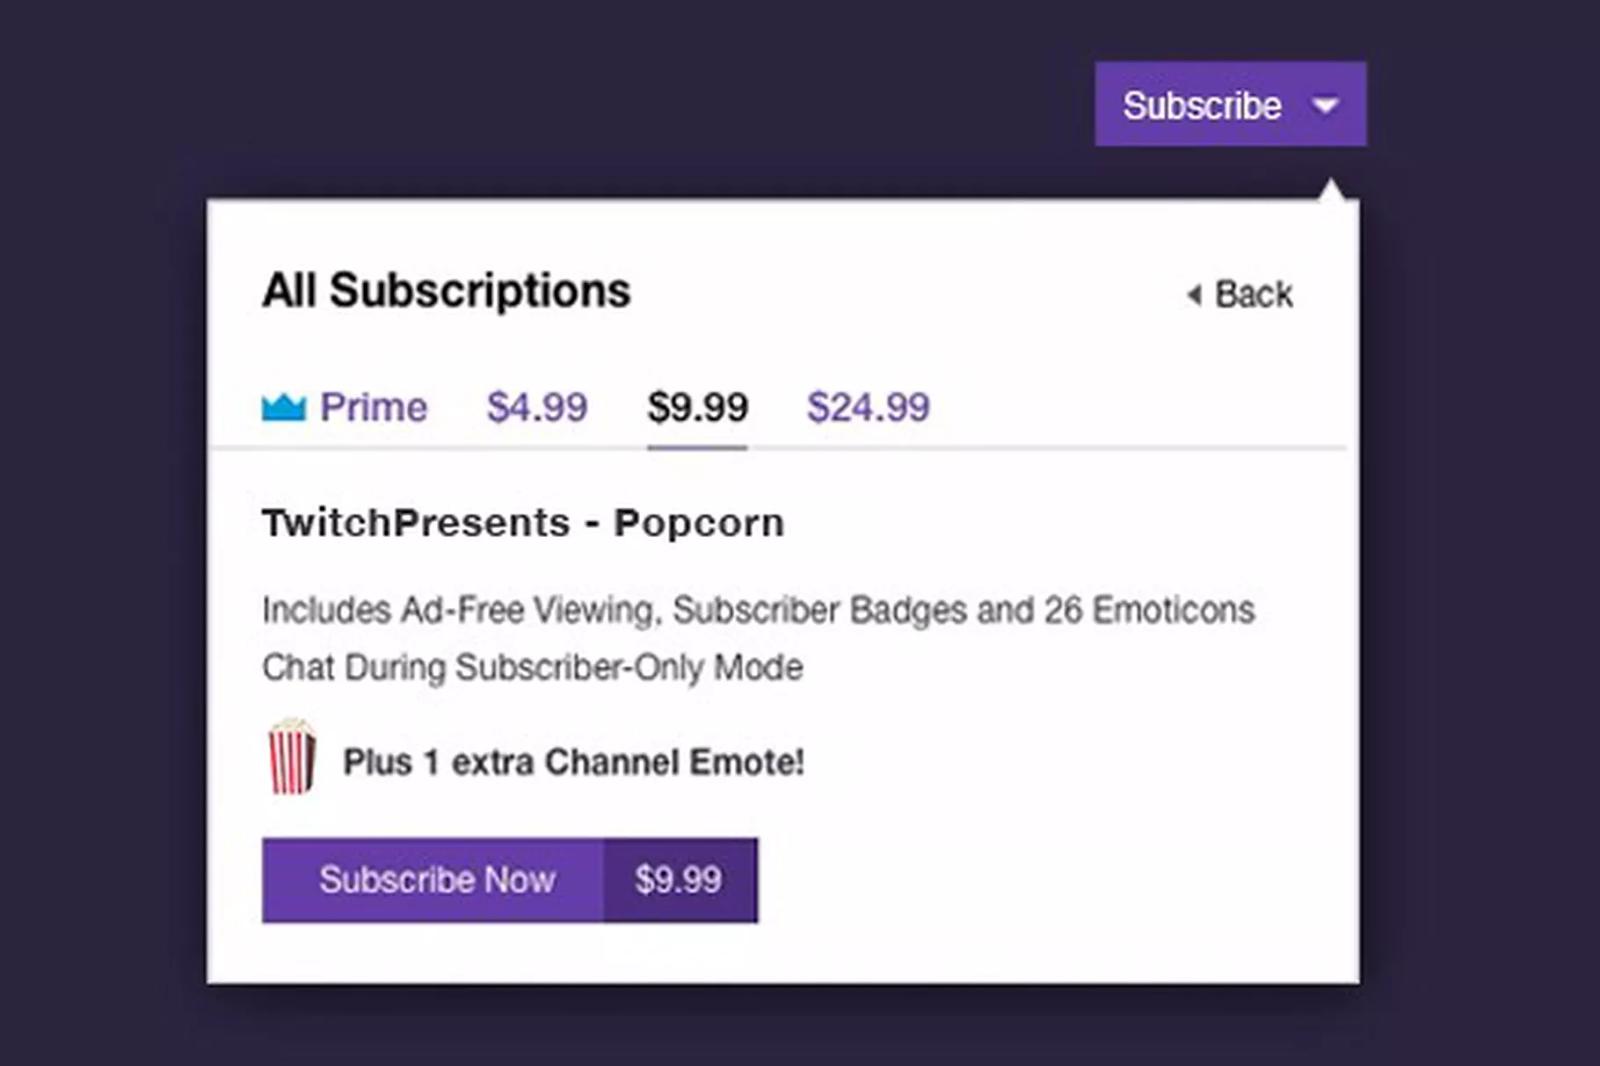 Twitch Price Tiers